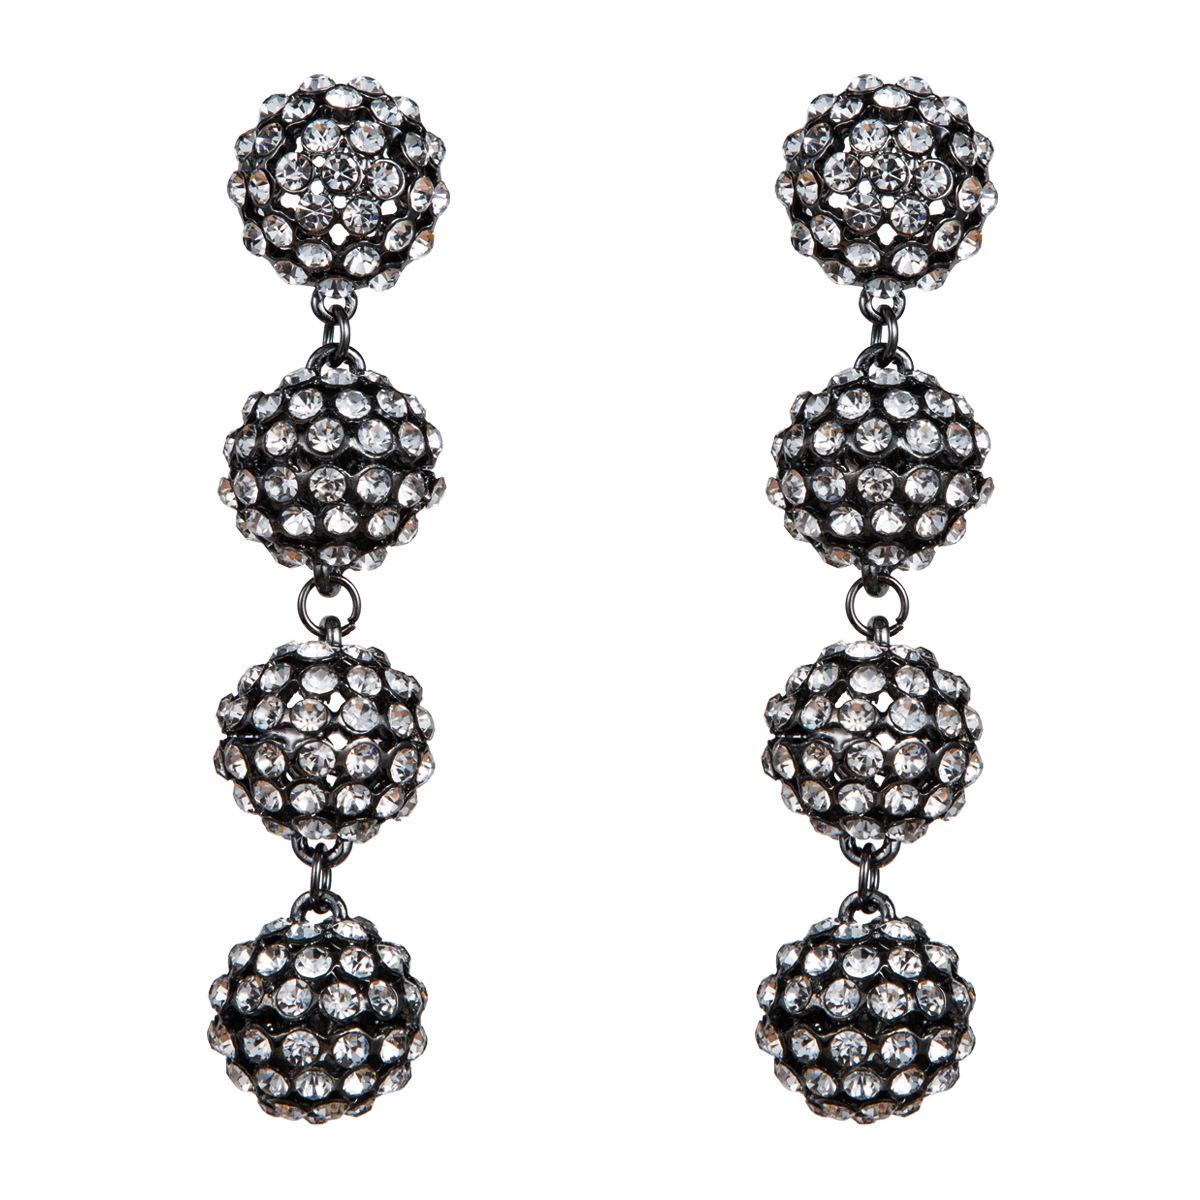 Fashion multi-layer acrylic full rhinestone ball earrings NHJE142058